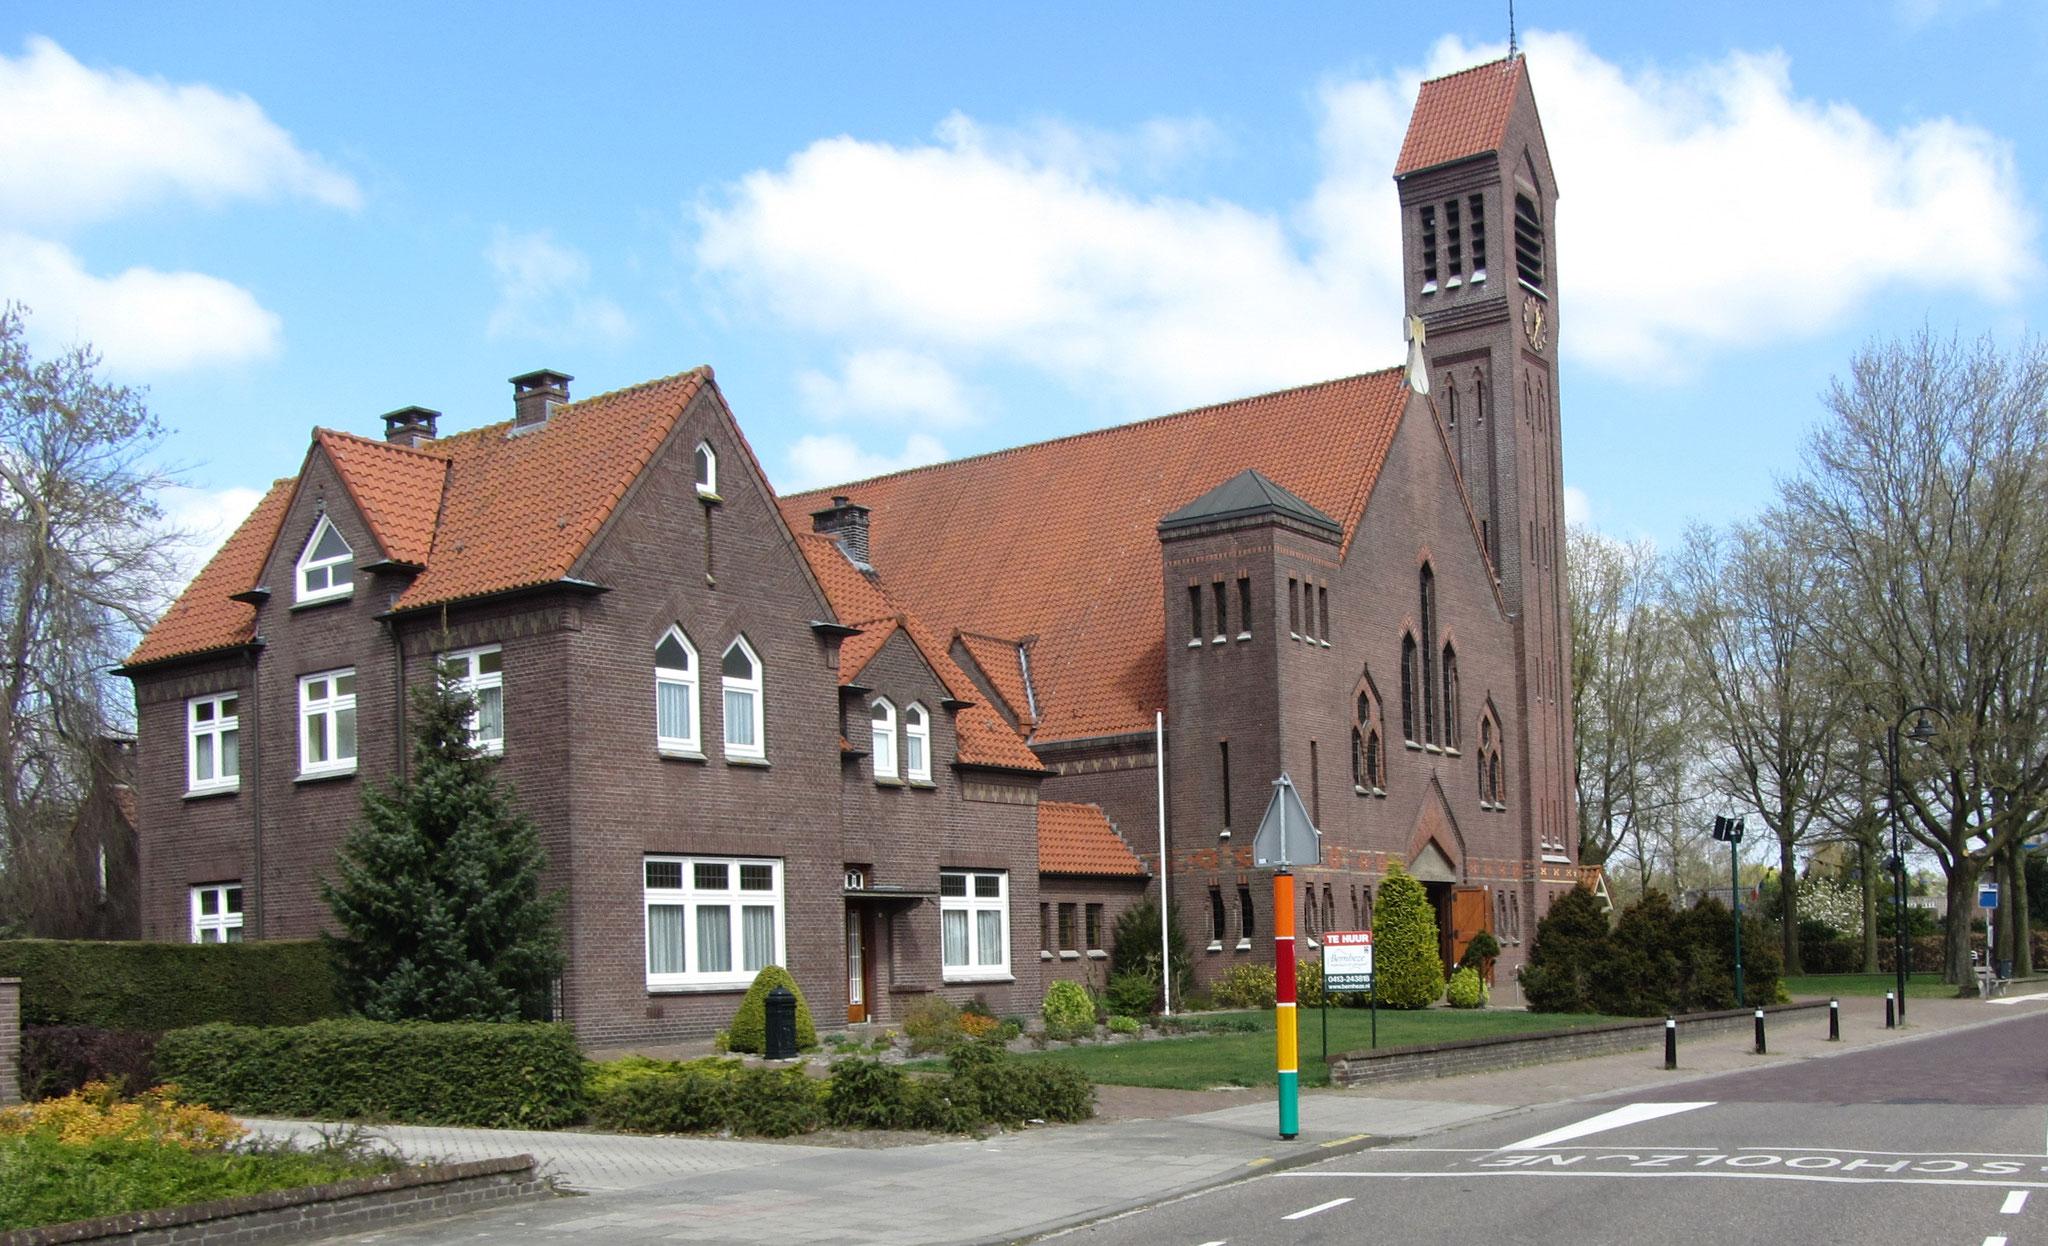 Straatbeeld Vorstenbosch, gebiedstype historisch dorpscentrum